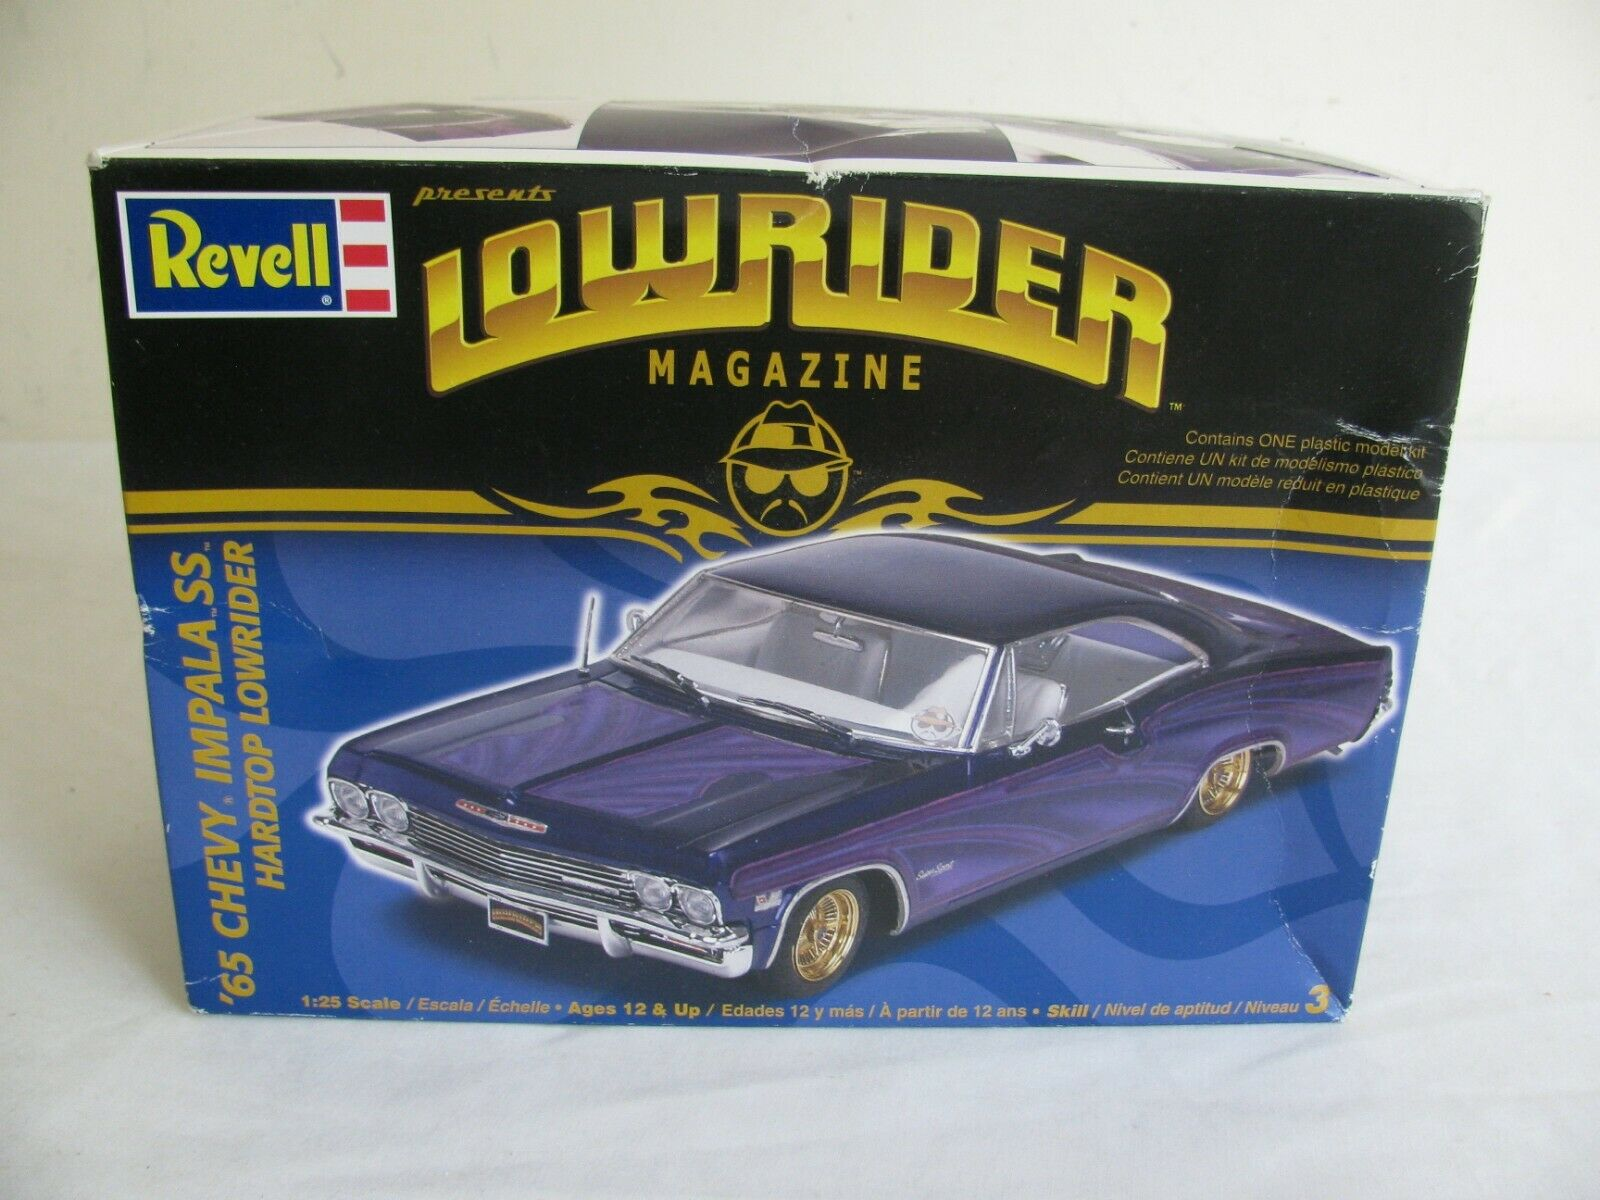 Revell Lowrider Magazine 1 25 Scale 1965 Chevrolet Impala SS Hardtop NIB